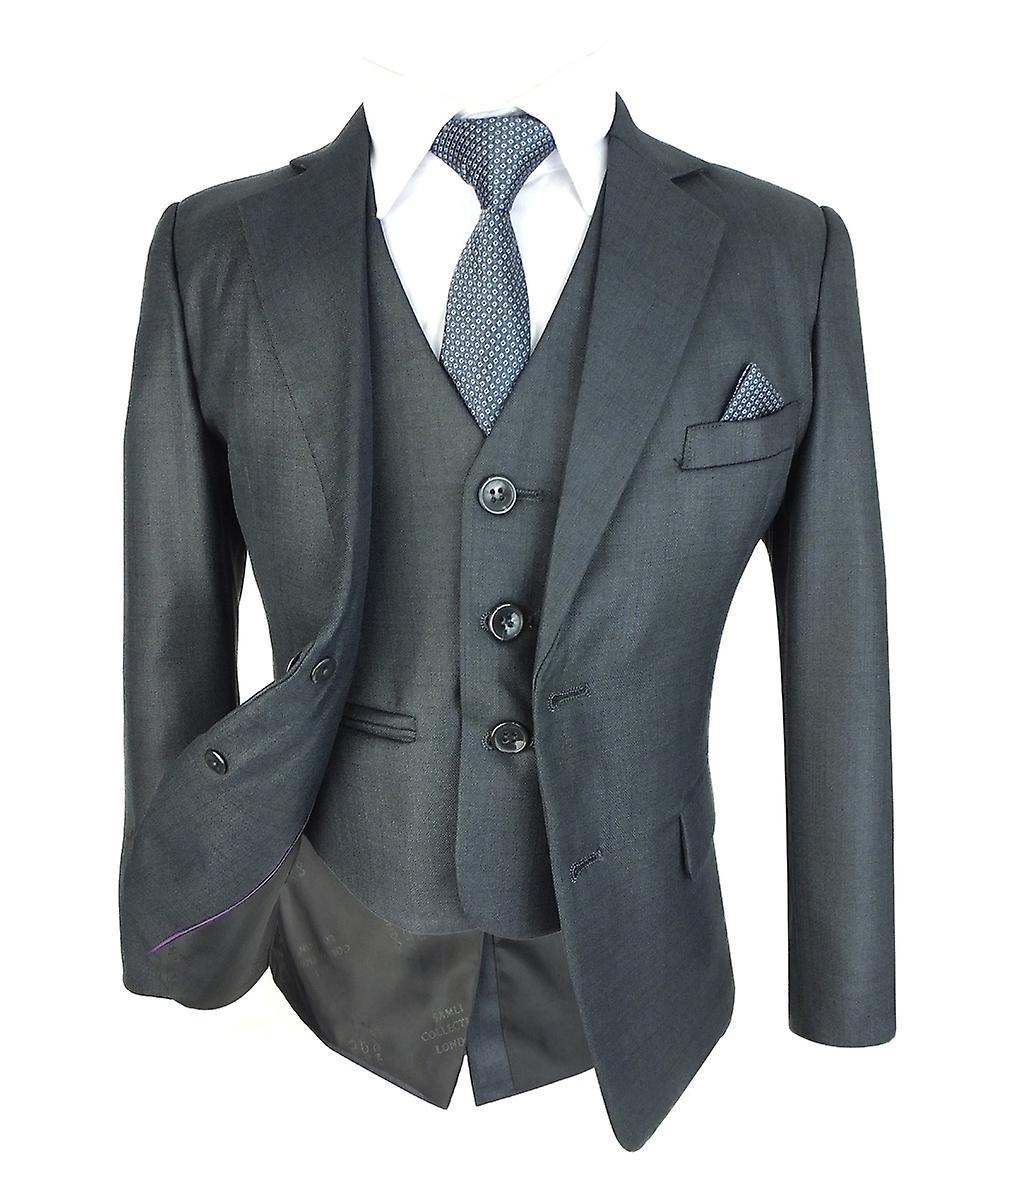 save off 26501 6181b Jungen Slim fit dunkel grau Anzug Komplettset